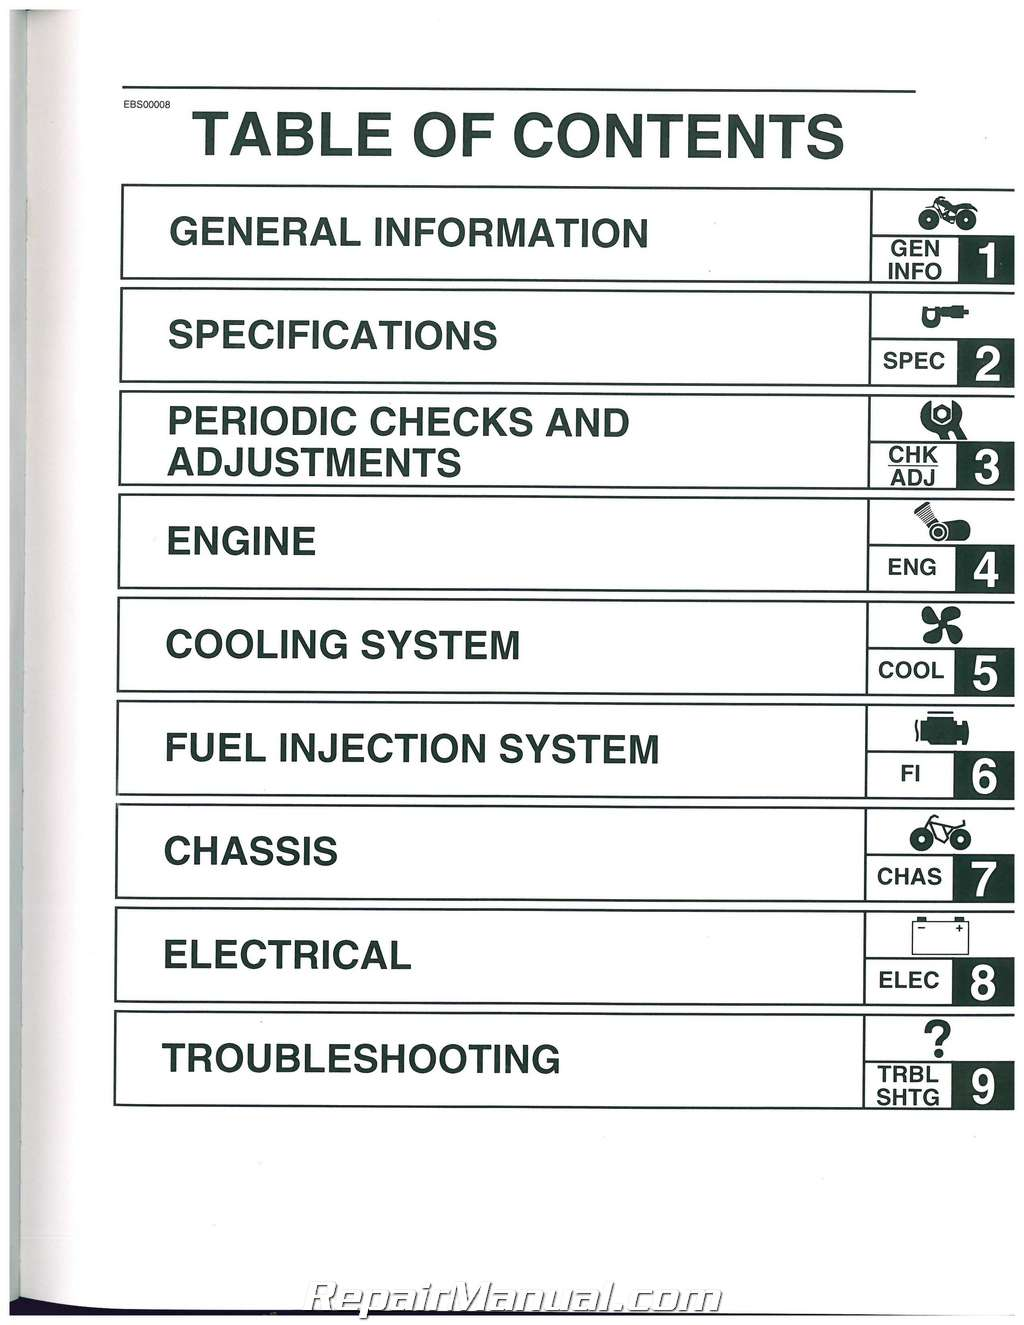 yamaha raptor 700 service manual